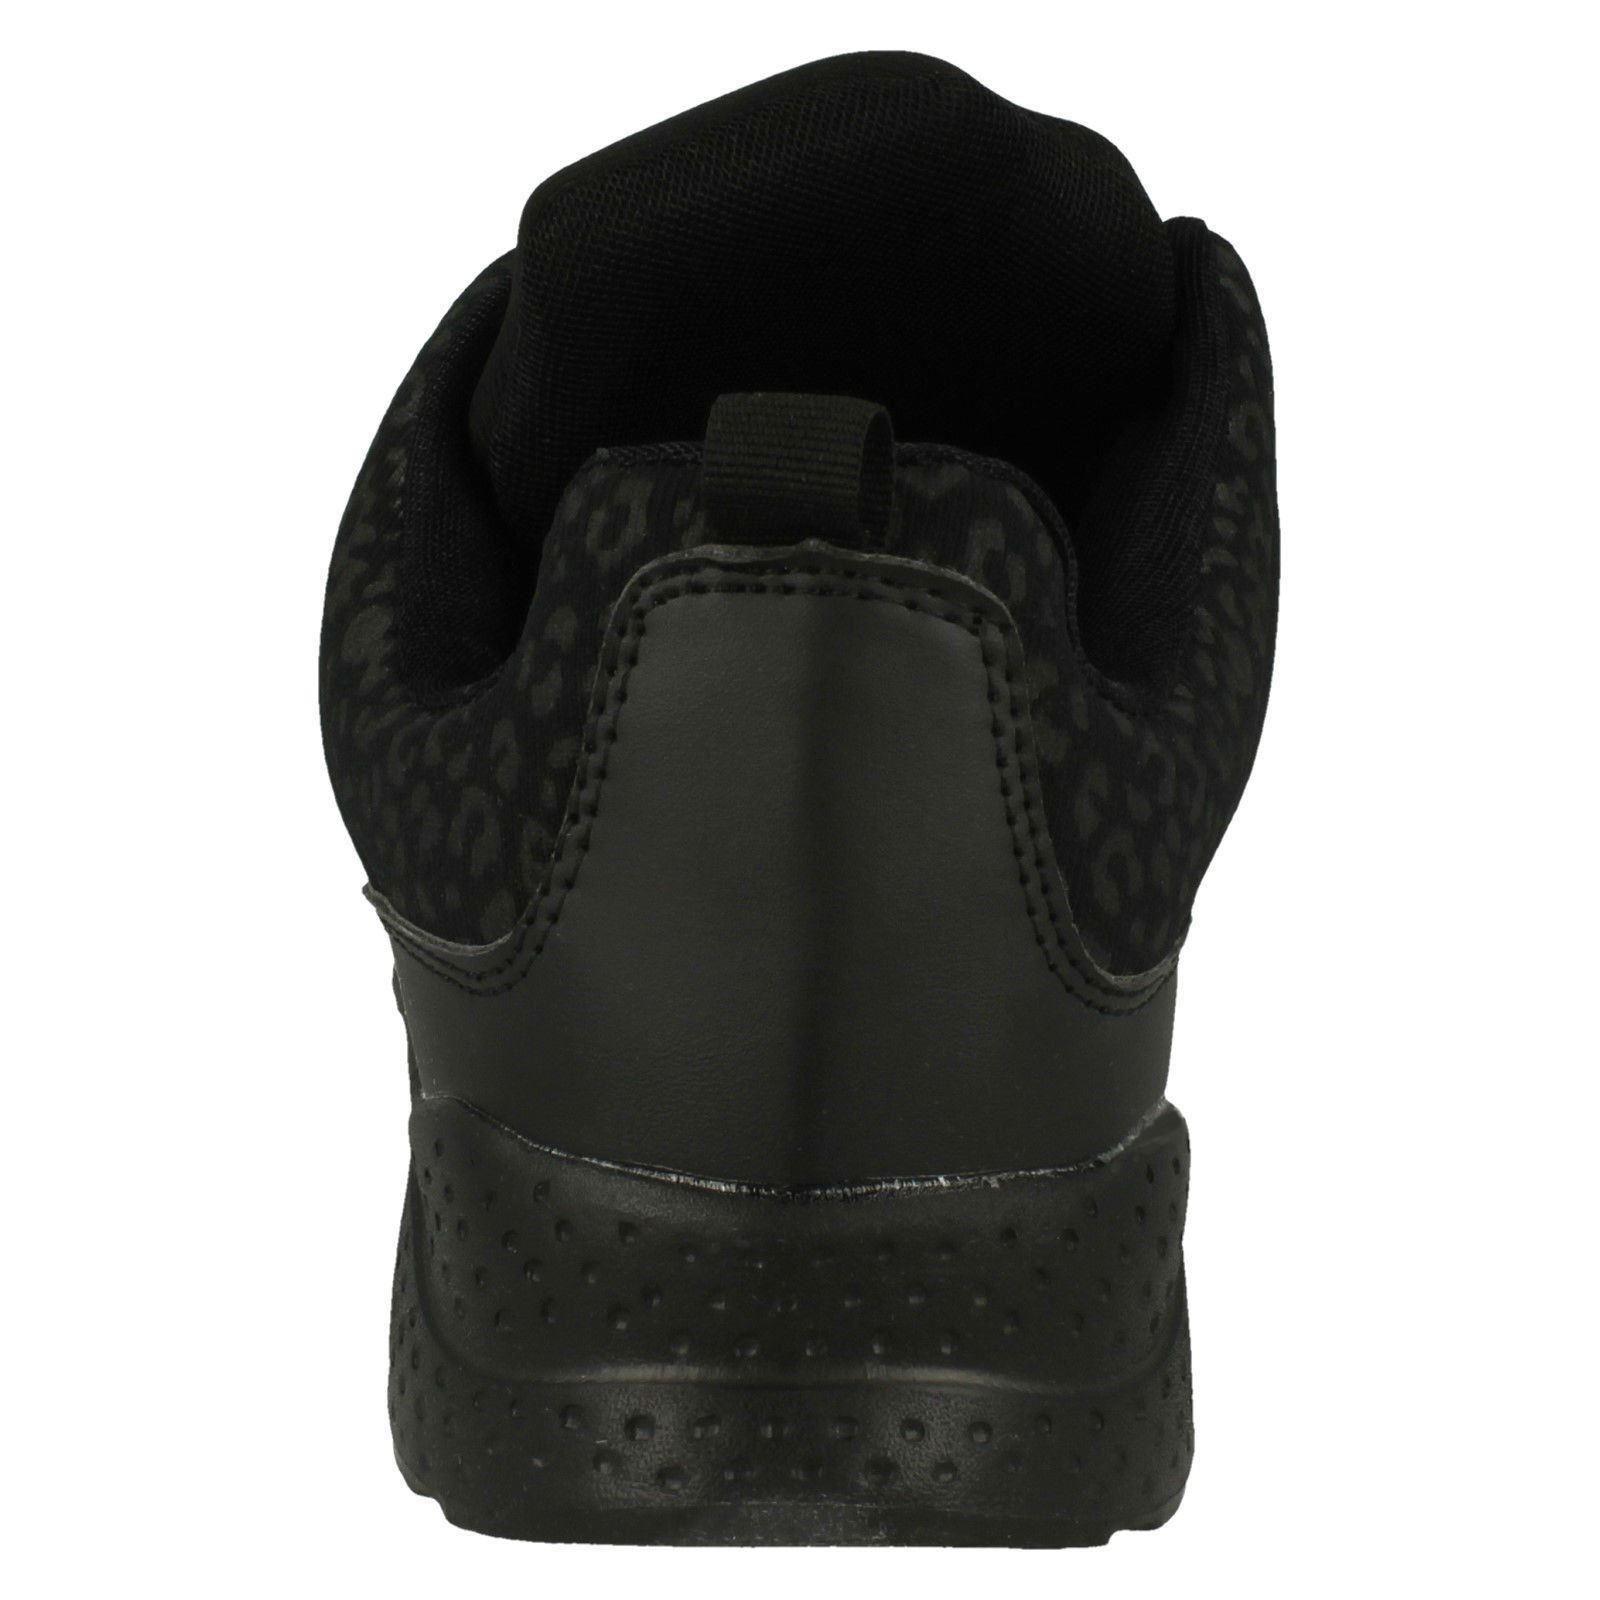 Noir Hommes Up Airtech Jersey lace New Baskets rYAfqYRw